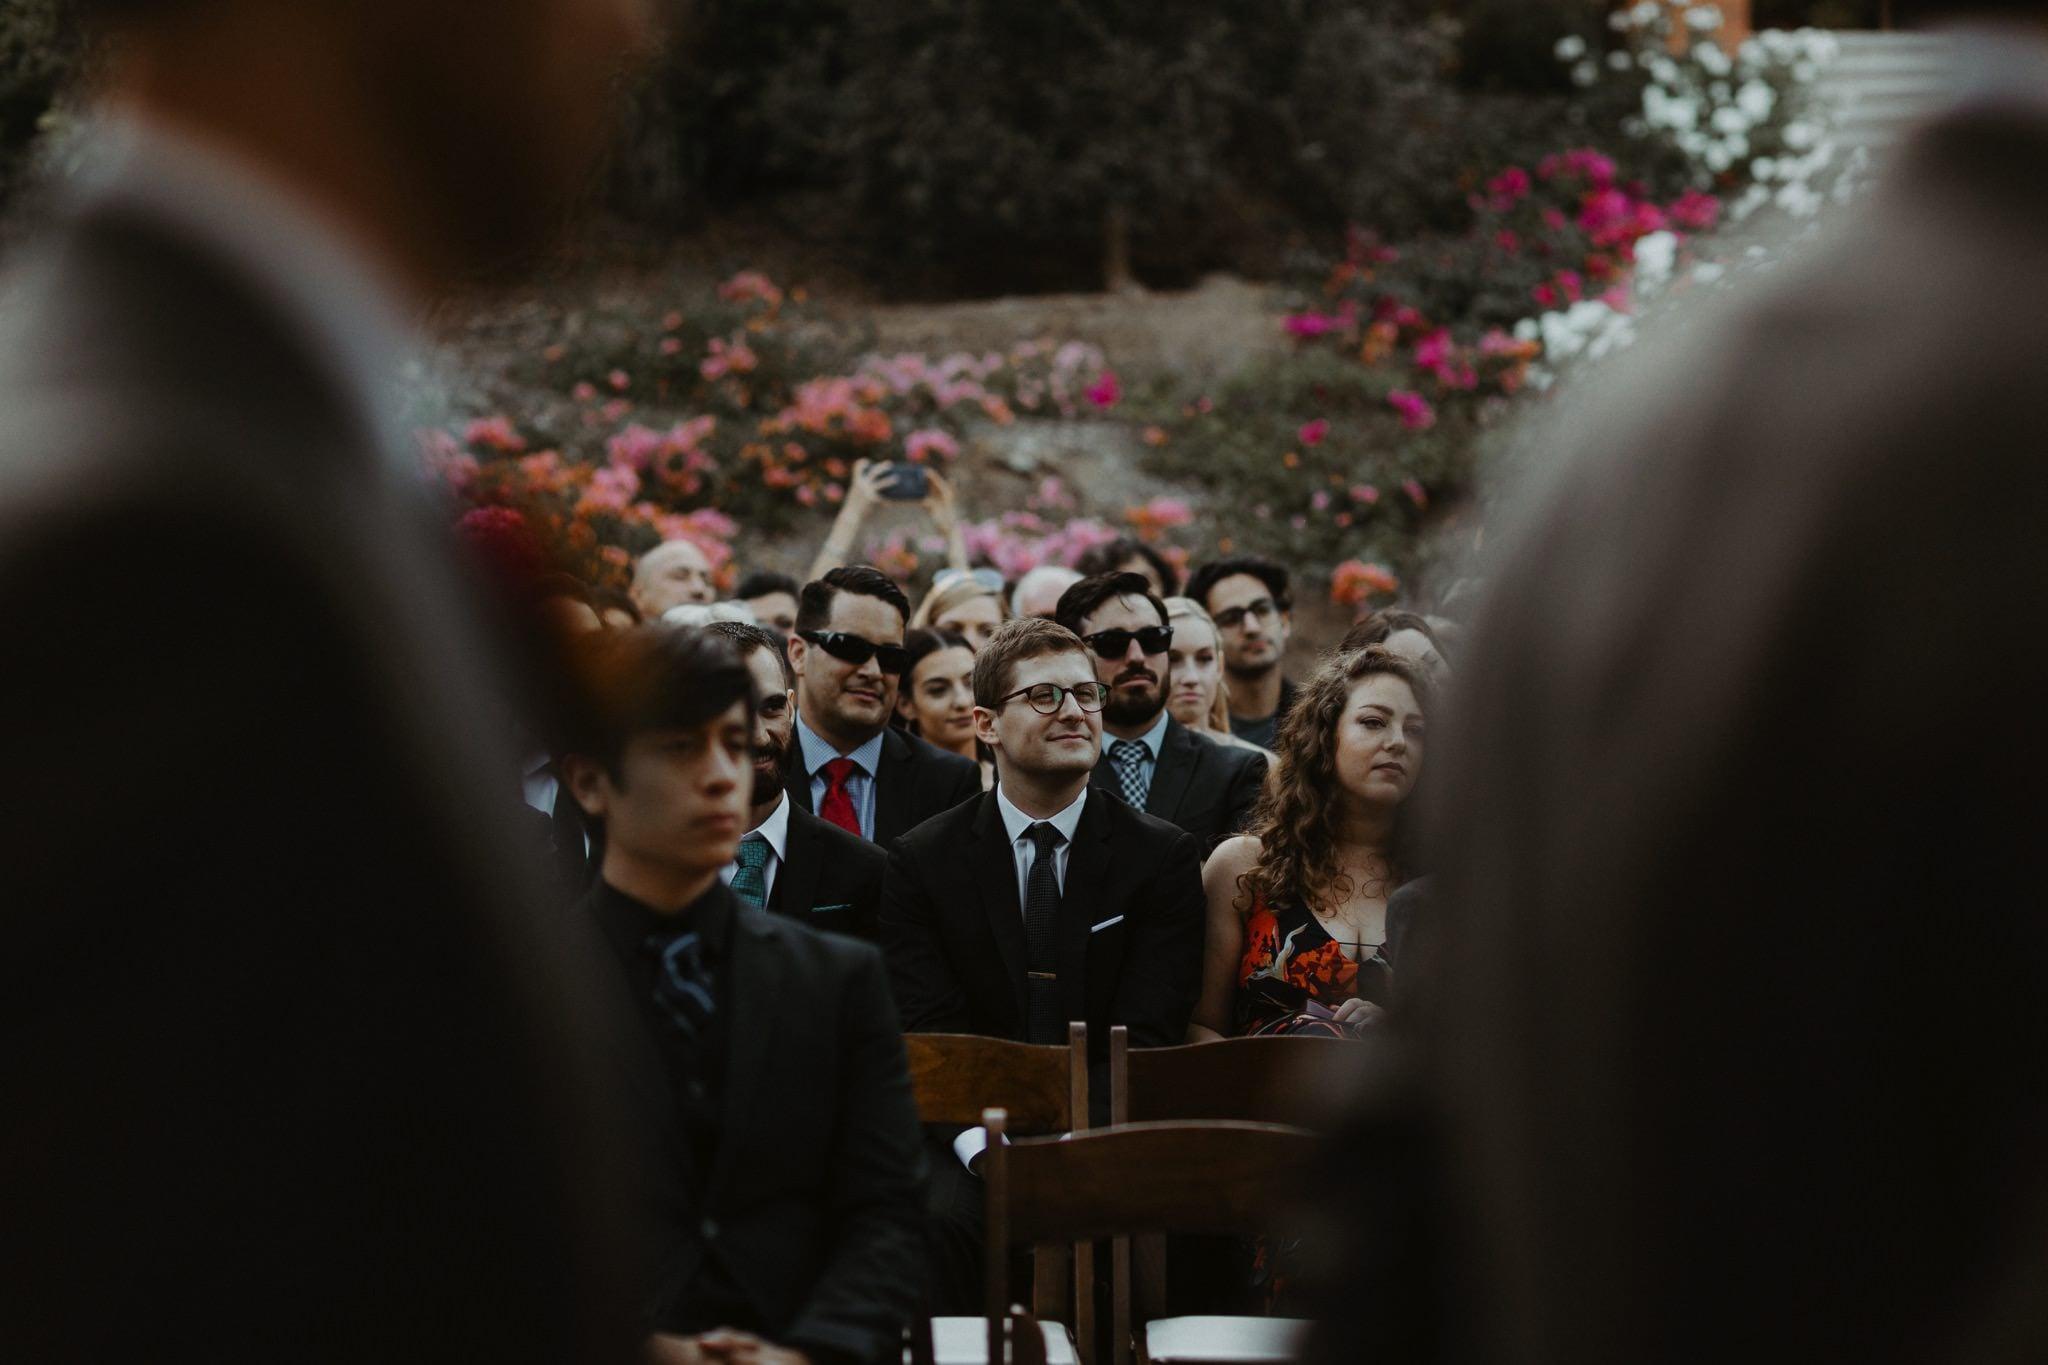 simi valley wedding photography 106